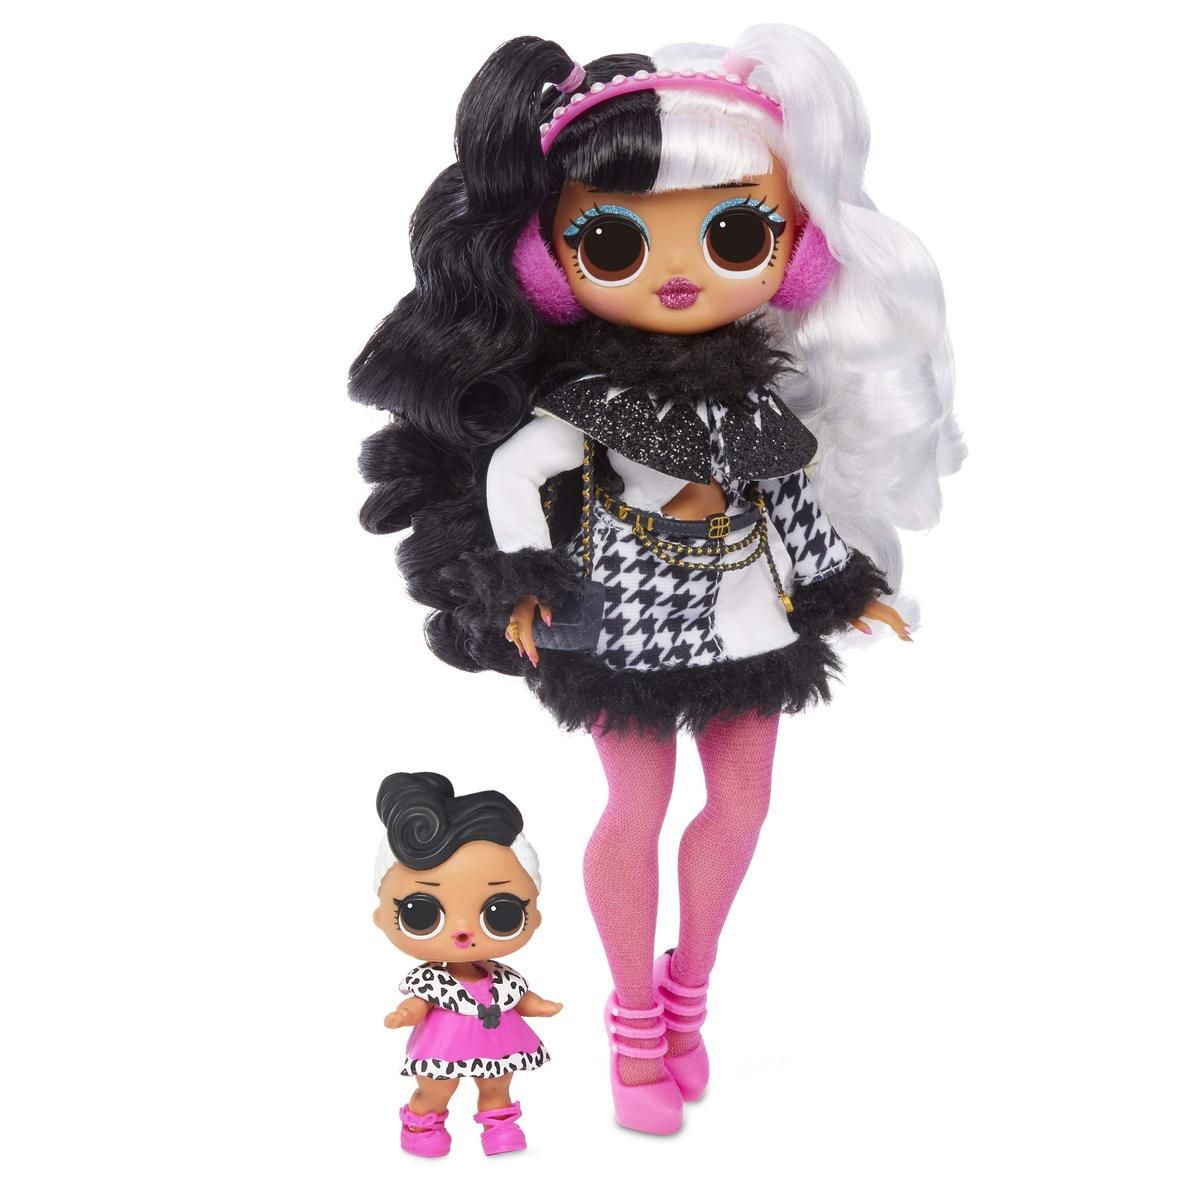 L O L Surprise O M G Winter Disco Dollie Fashion Doll Sister Sister Dolls Fashion Dolls Lol Dolls